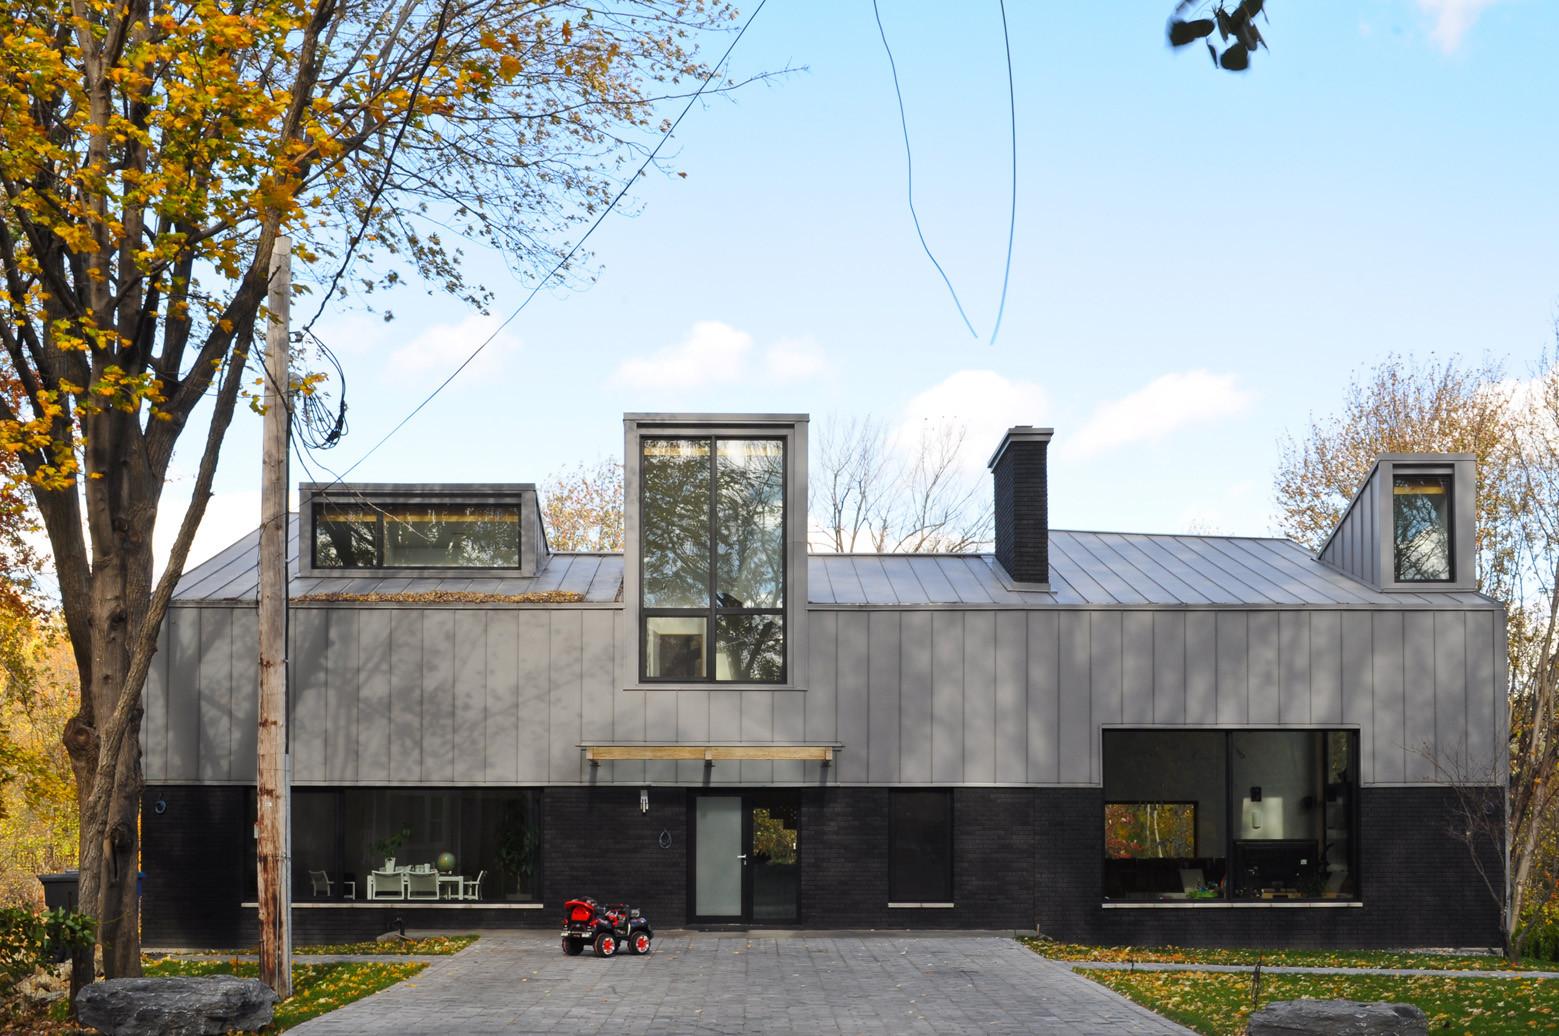 Crisan House / EST Architecture, © Claudiu Olaru